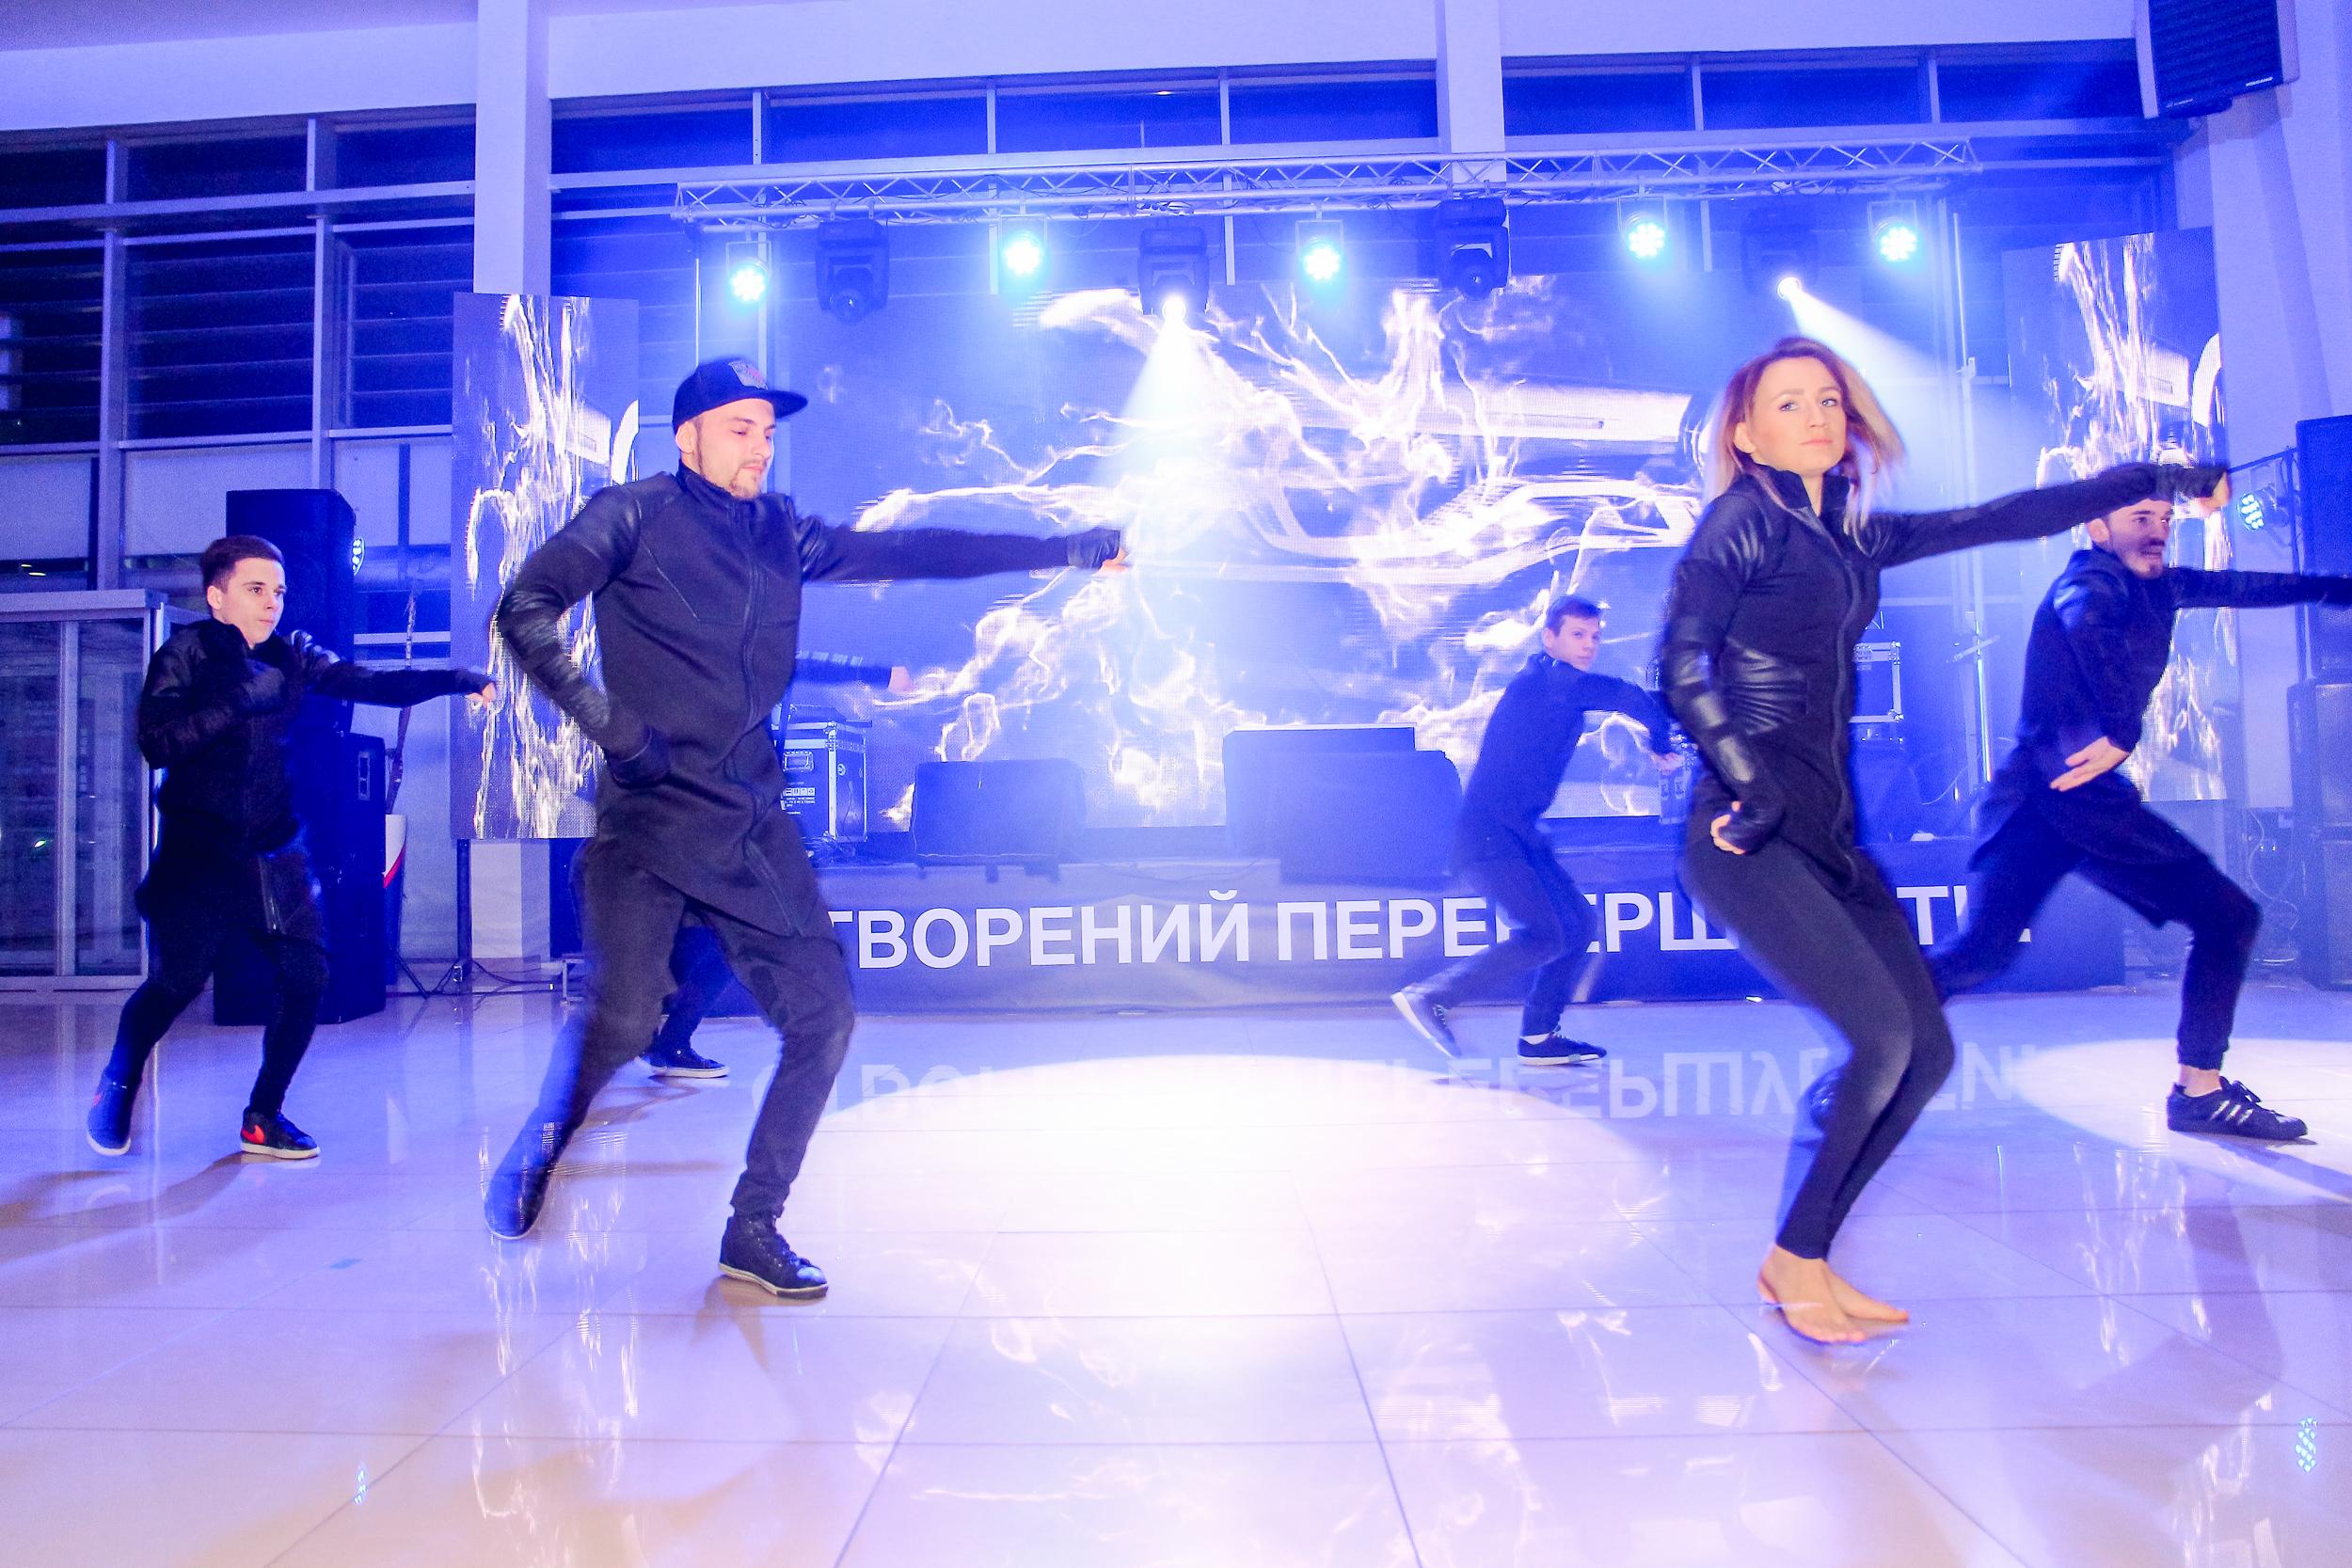 Танцевальный коллектив на презентации BMW Be happy Nikolaev